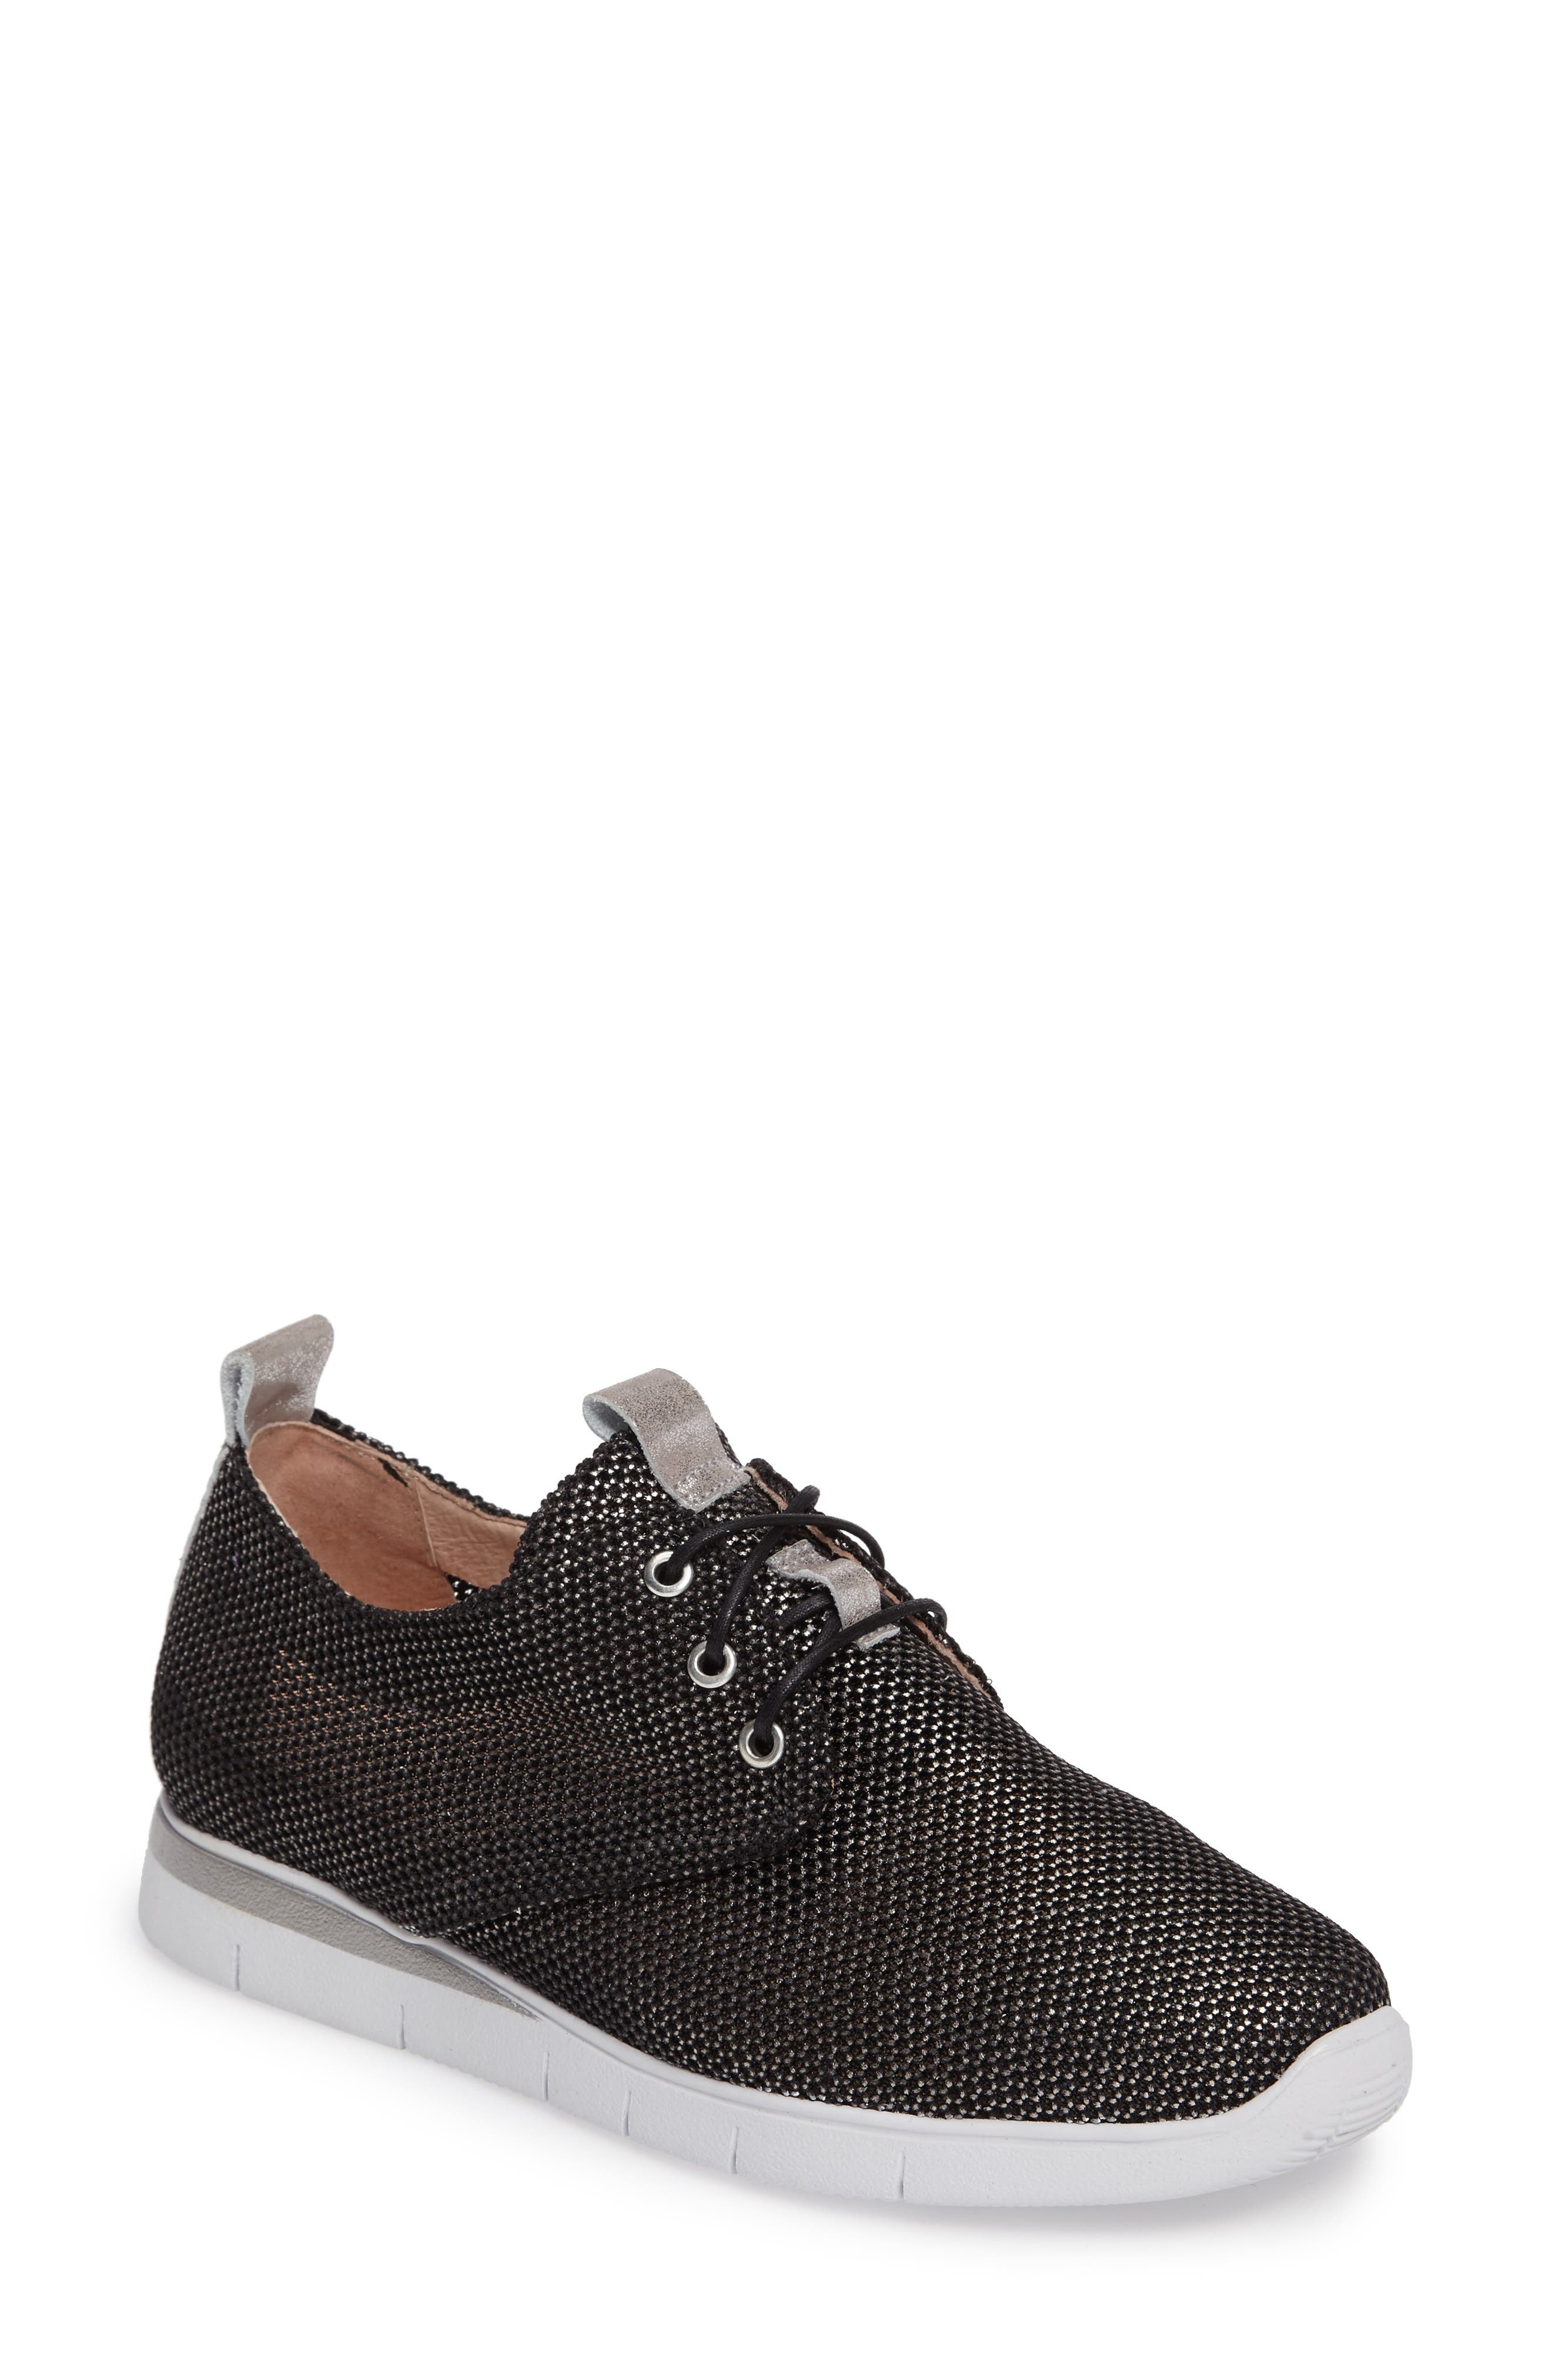 Gala Perforated Sneaker,                         Main,                         color, 001